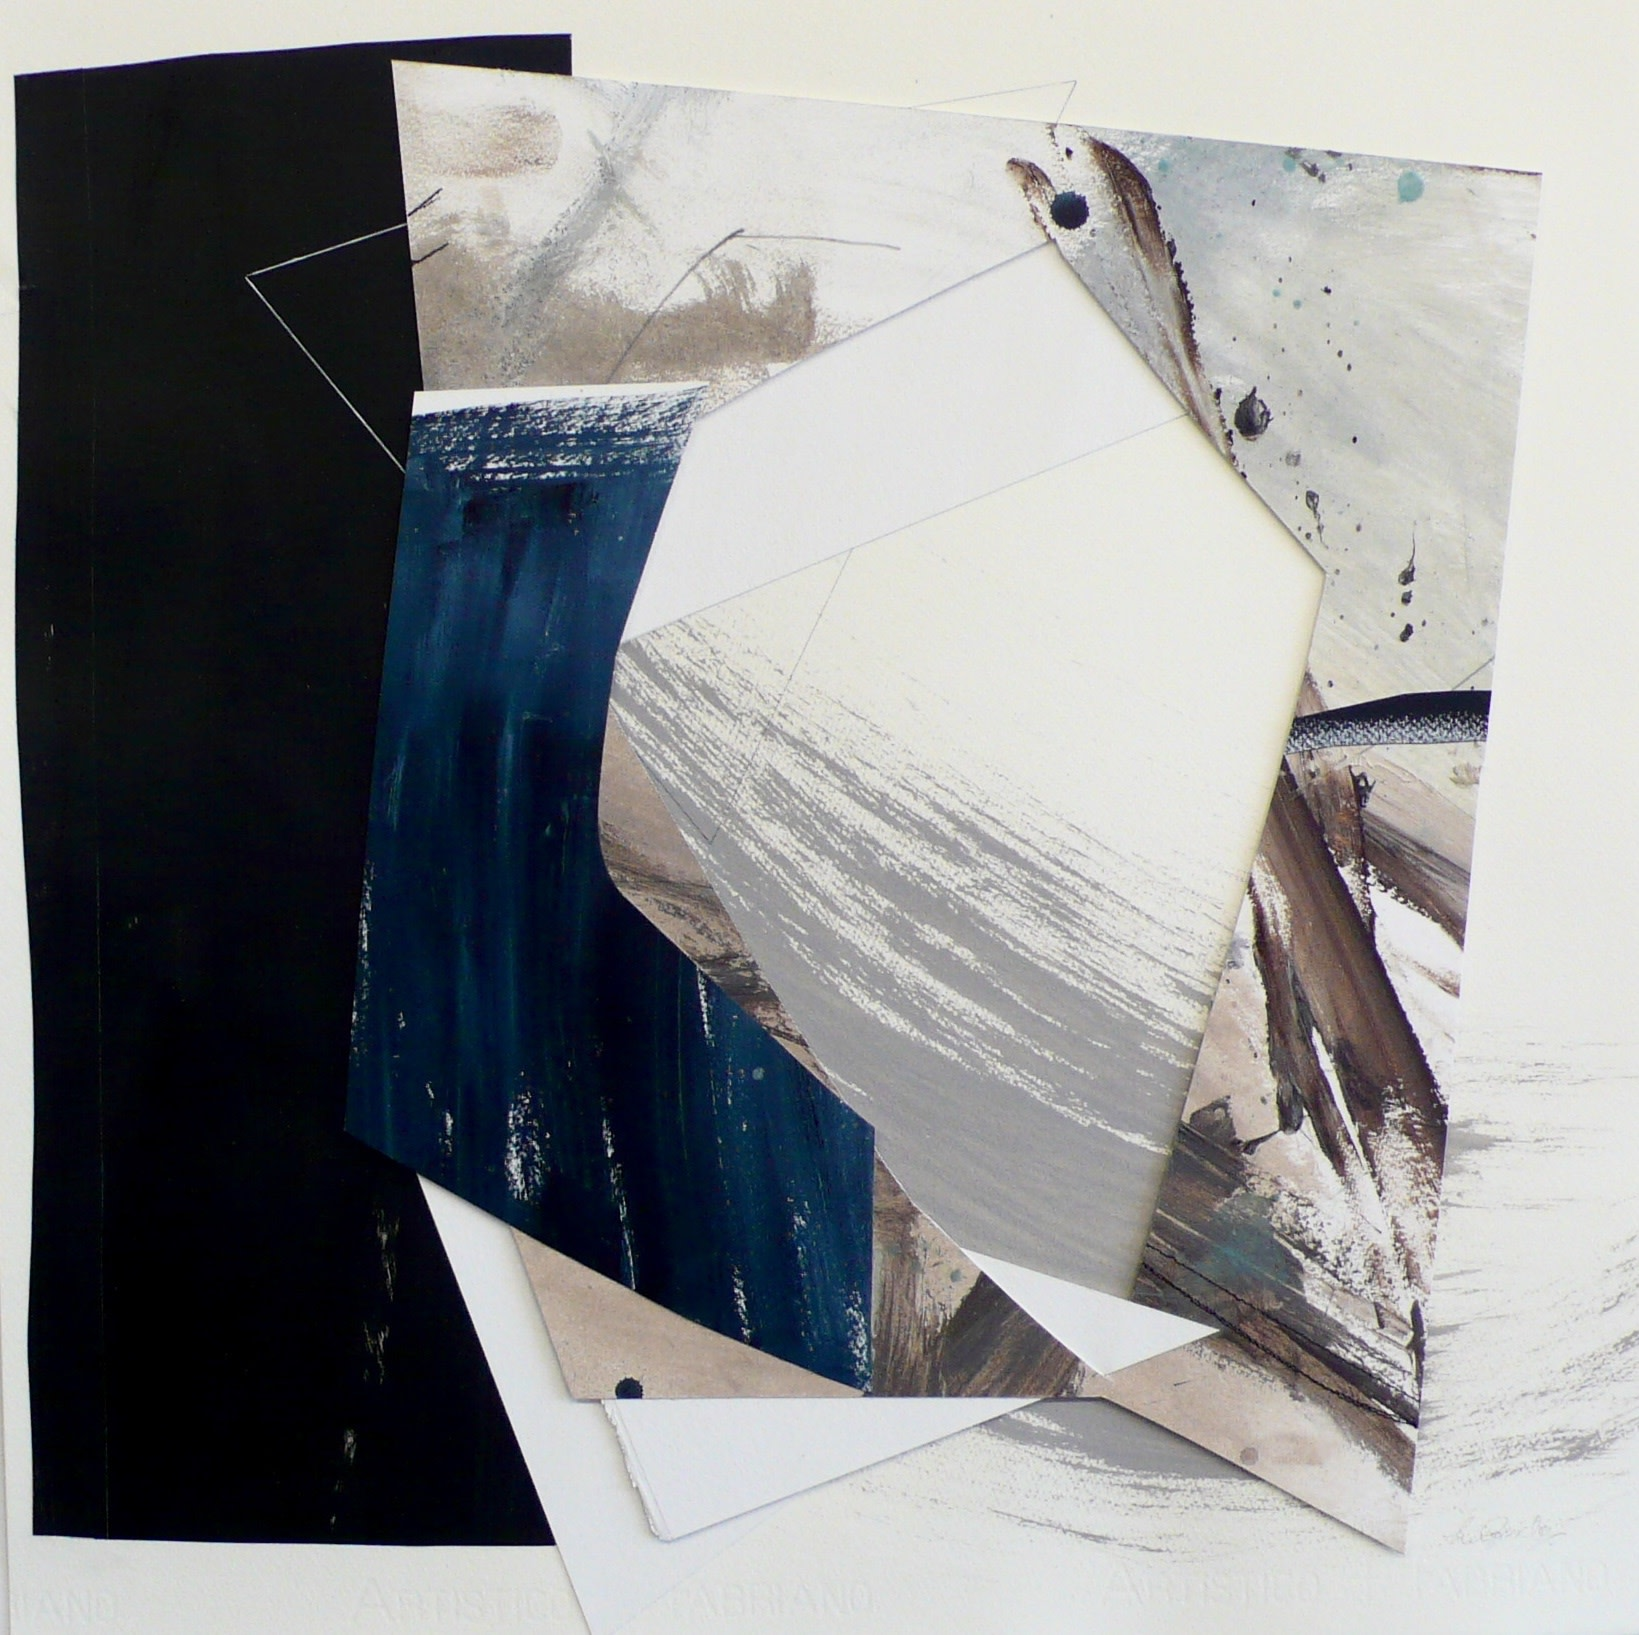 <span class=&#34;link fancybox-details-link&#34;><a href=&#34;/exhibitions/24/works/artworks_standalone10806/&#34;>View Detail Page</a></span><div class=&#34;artist&#34;><span class=&#34;artist&#34;><strong>Lisa Traxler</strong></span></div><div class=&#34;title&#34;><em>Earth Station</em></div><div class=&#34;medium&#34;>acrylic, thread & collage</div><div class=&#34;dimensions&#34;>72x72cm</div>